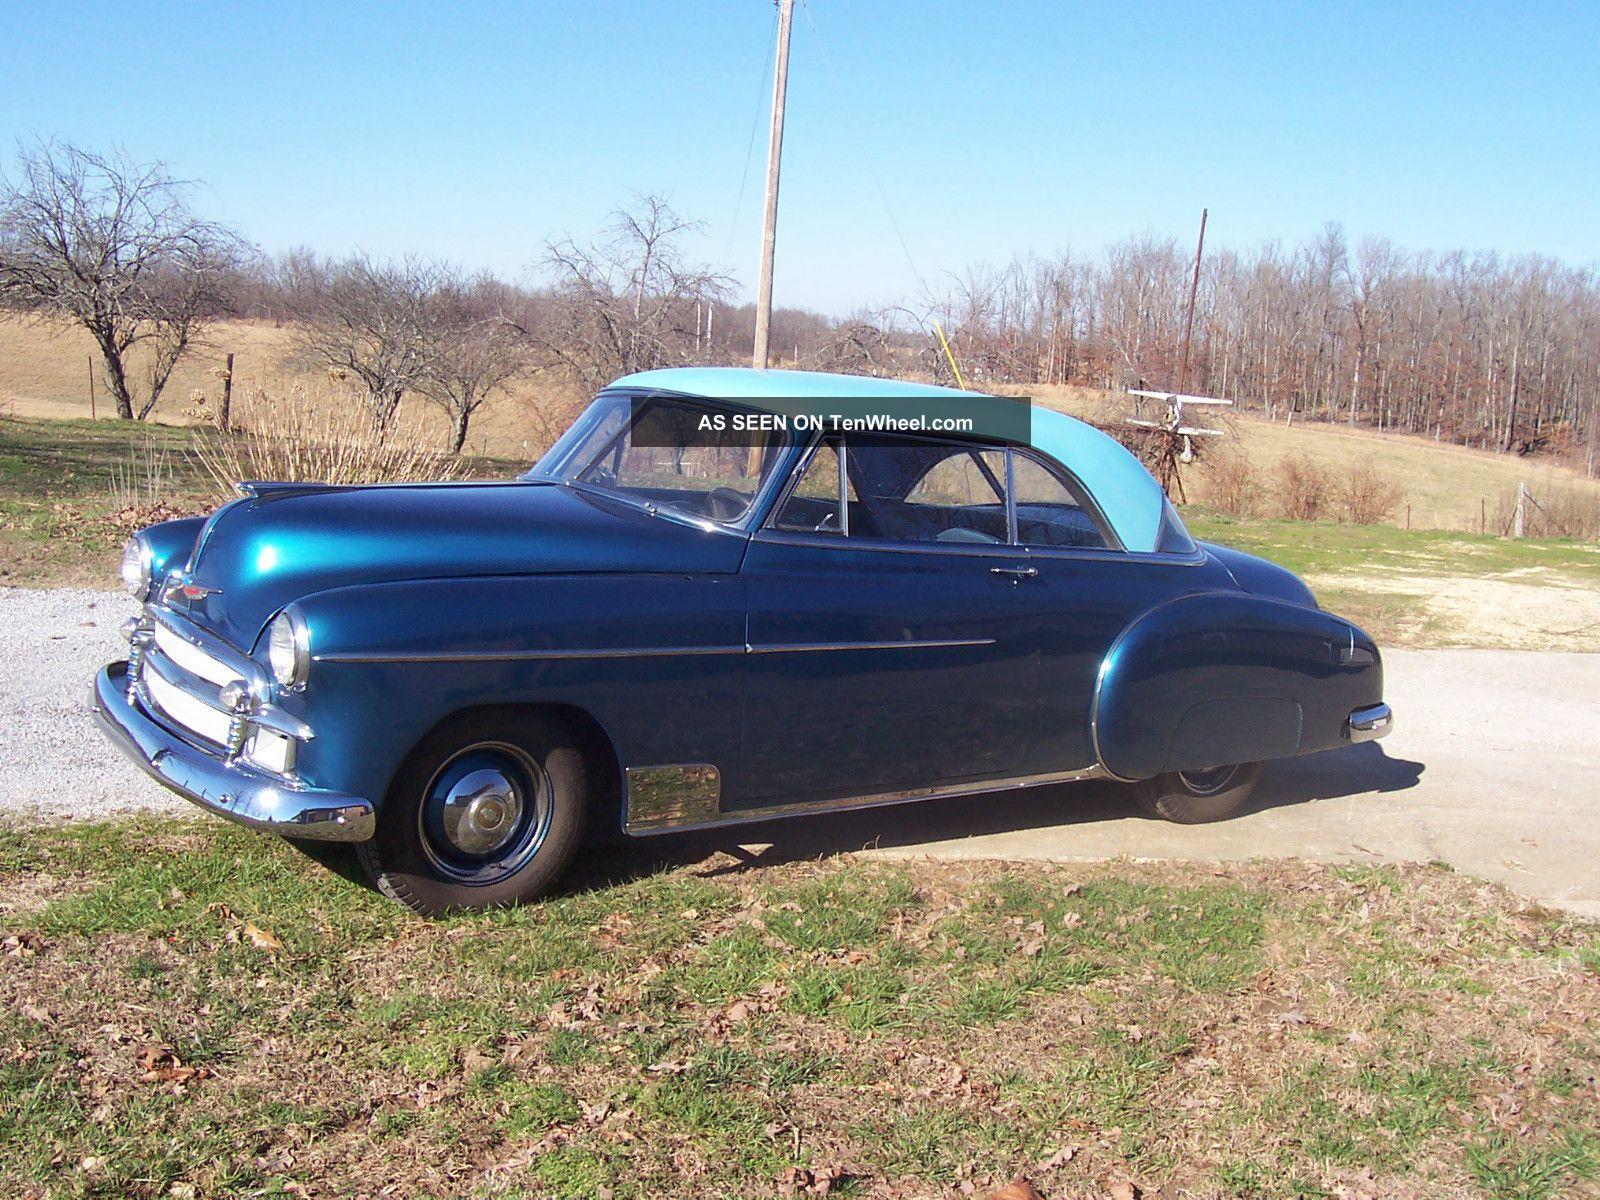 1950 Chevy Belaire Ht.  Blue Exterior Blue Interior Bel Air/150/210 photo